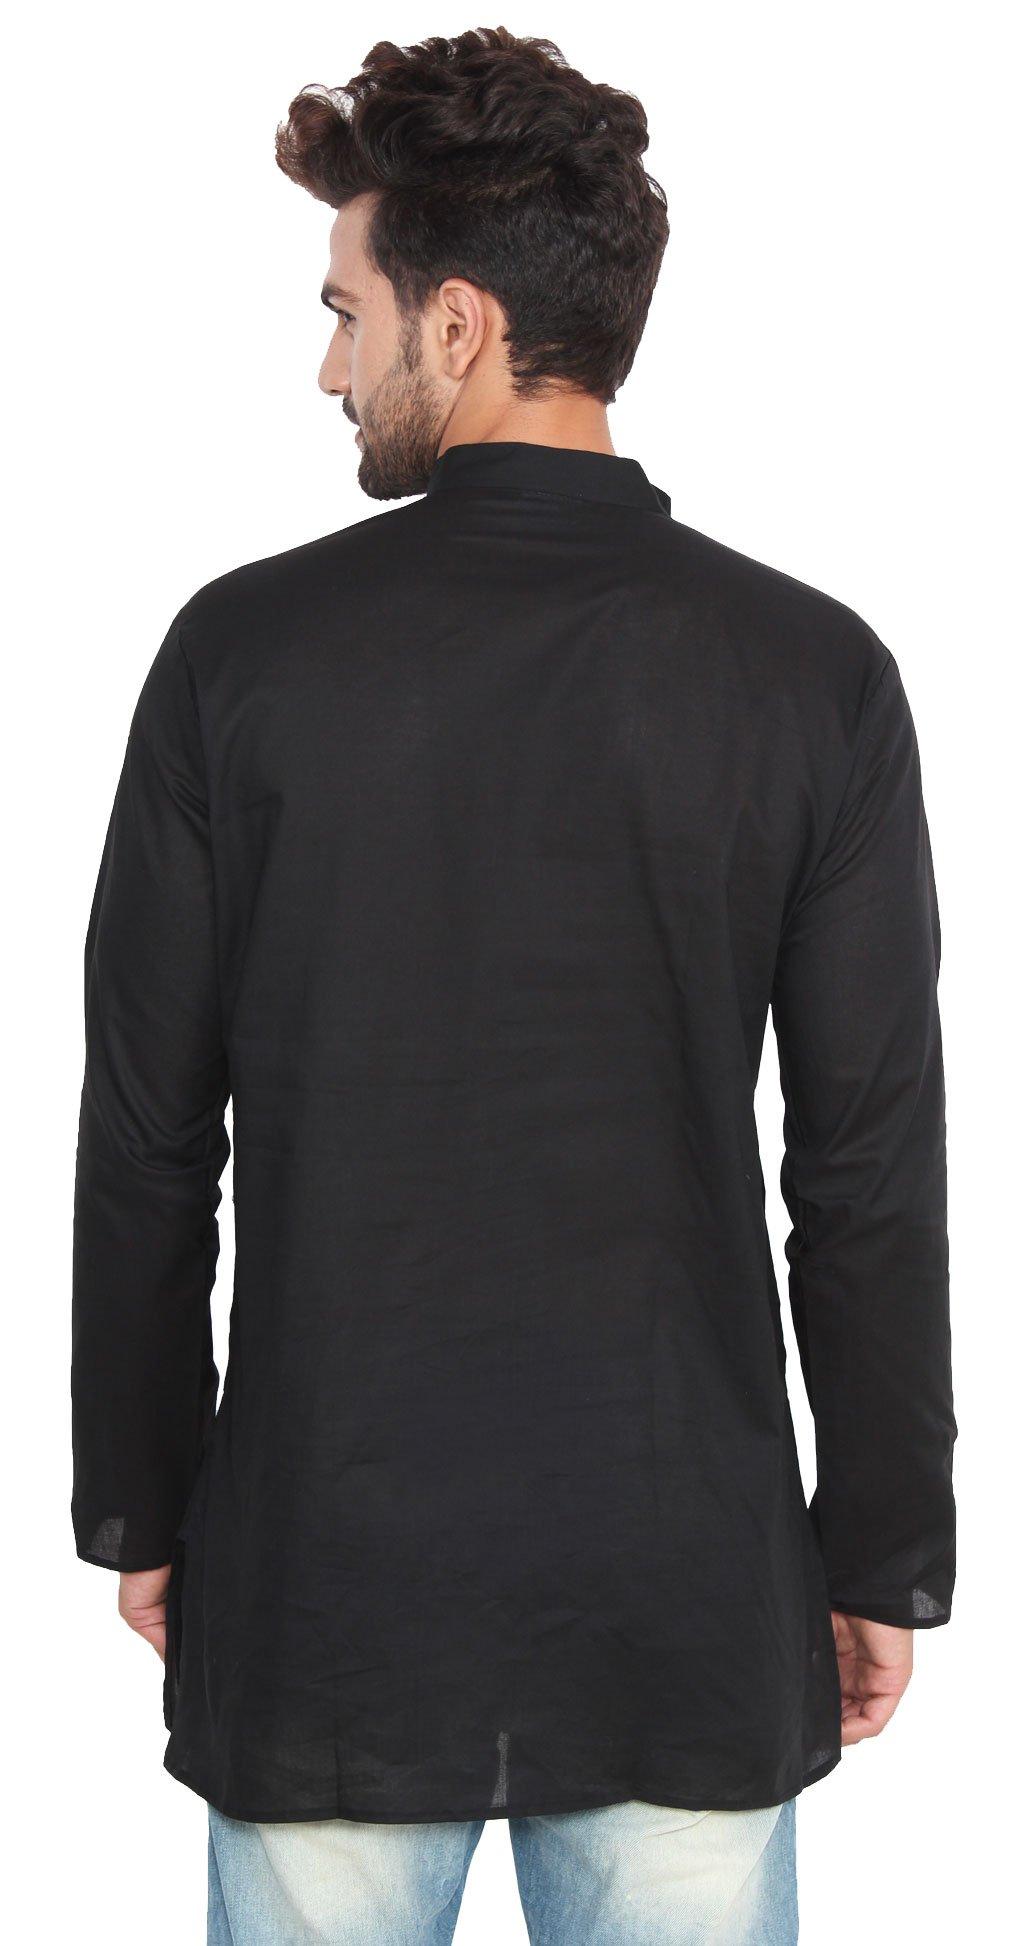 Cotton Dress Mens Short Kurta Shirt India Fashion Clothes (Black, M) by Maple Clothing (Image #4)